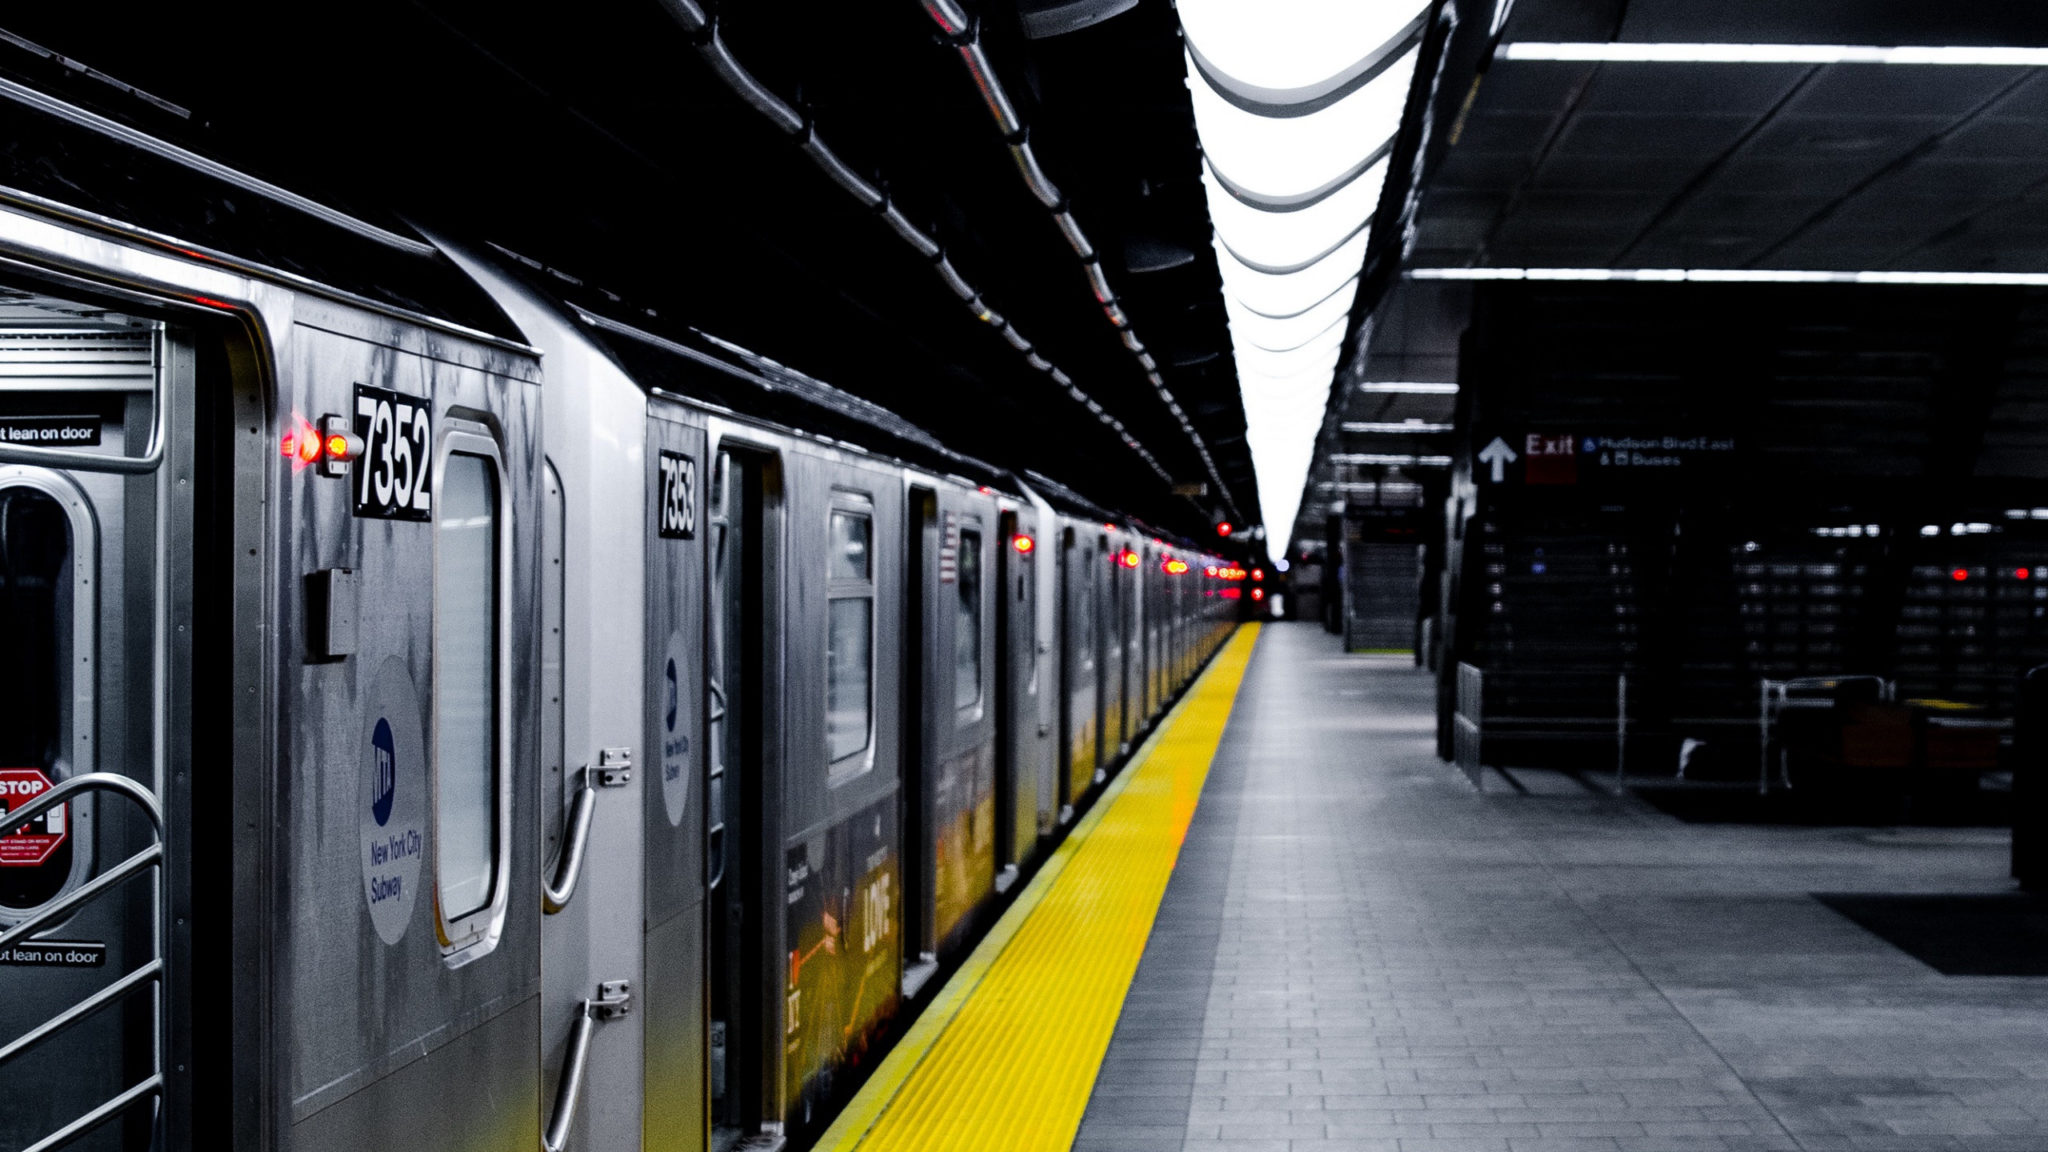 metro-podzemka-stantsiia-poezd